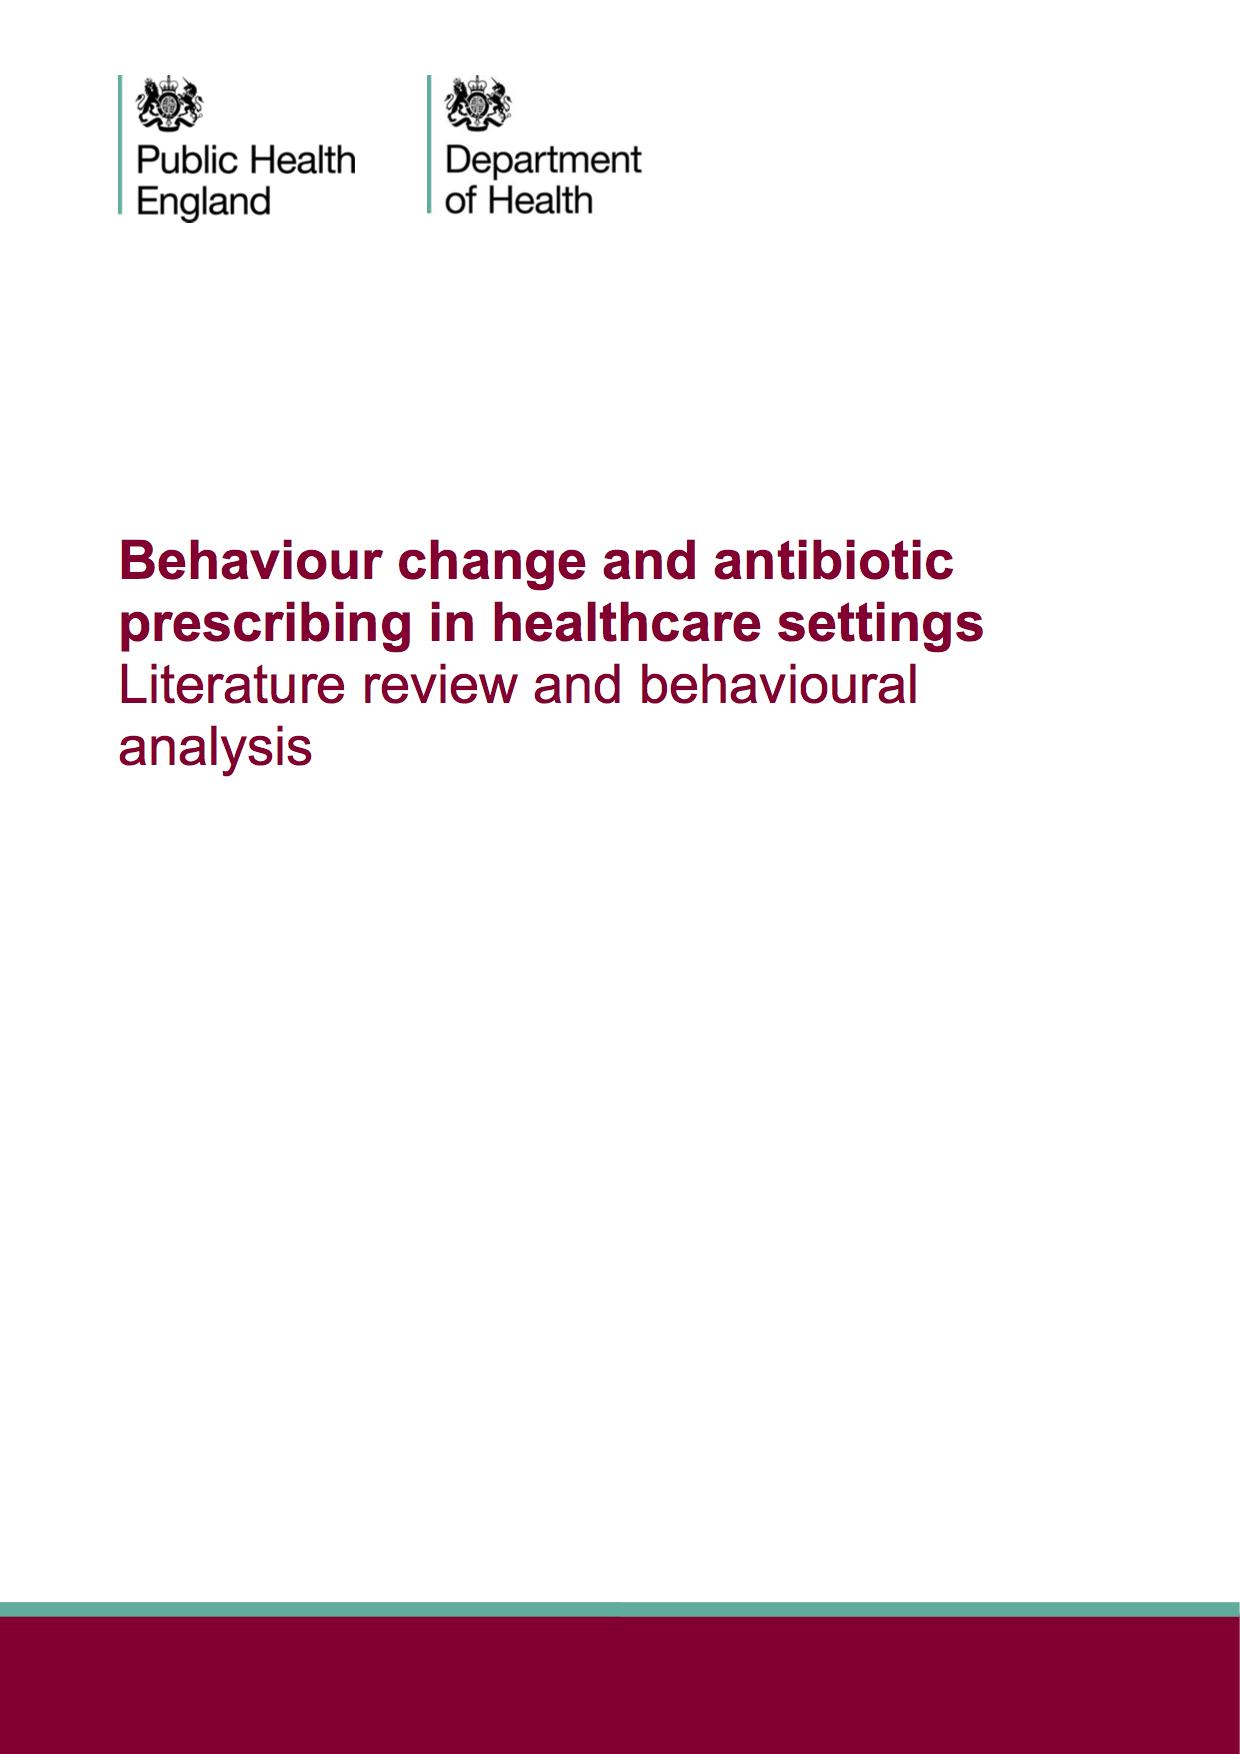 Literature review on consumer buying behavior analysis - Stonewall ...